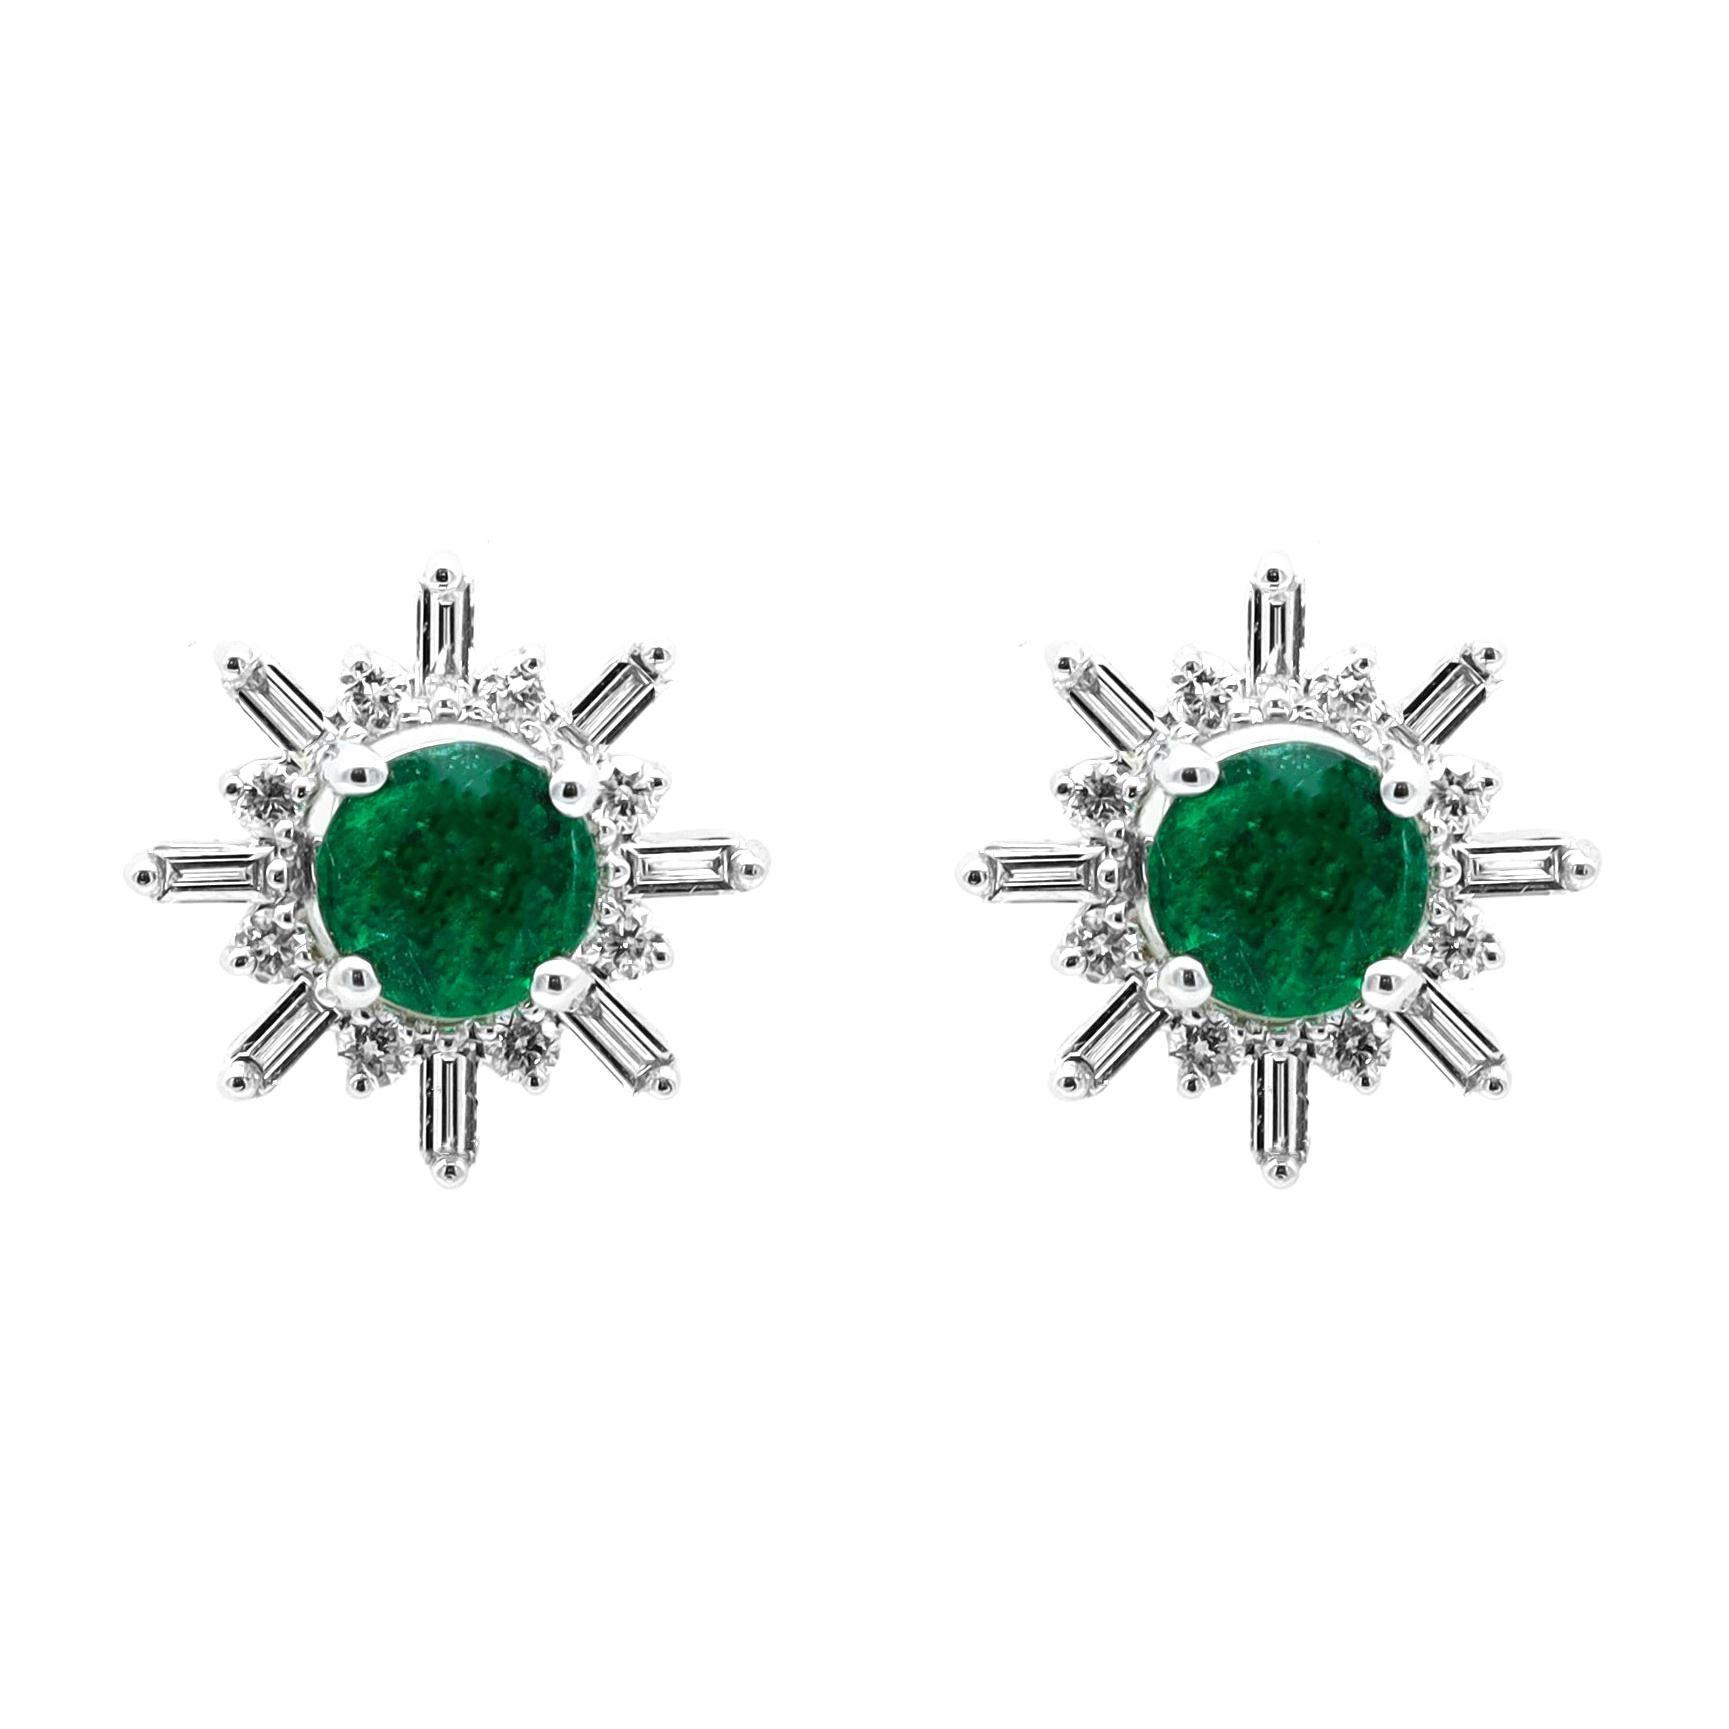 18 Karat White Gold Round-Cut Emerald and Diamond Stud Earrings